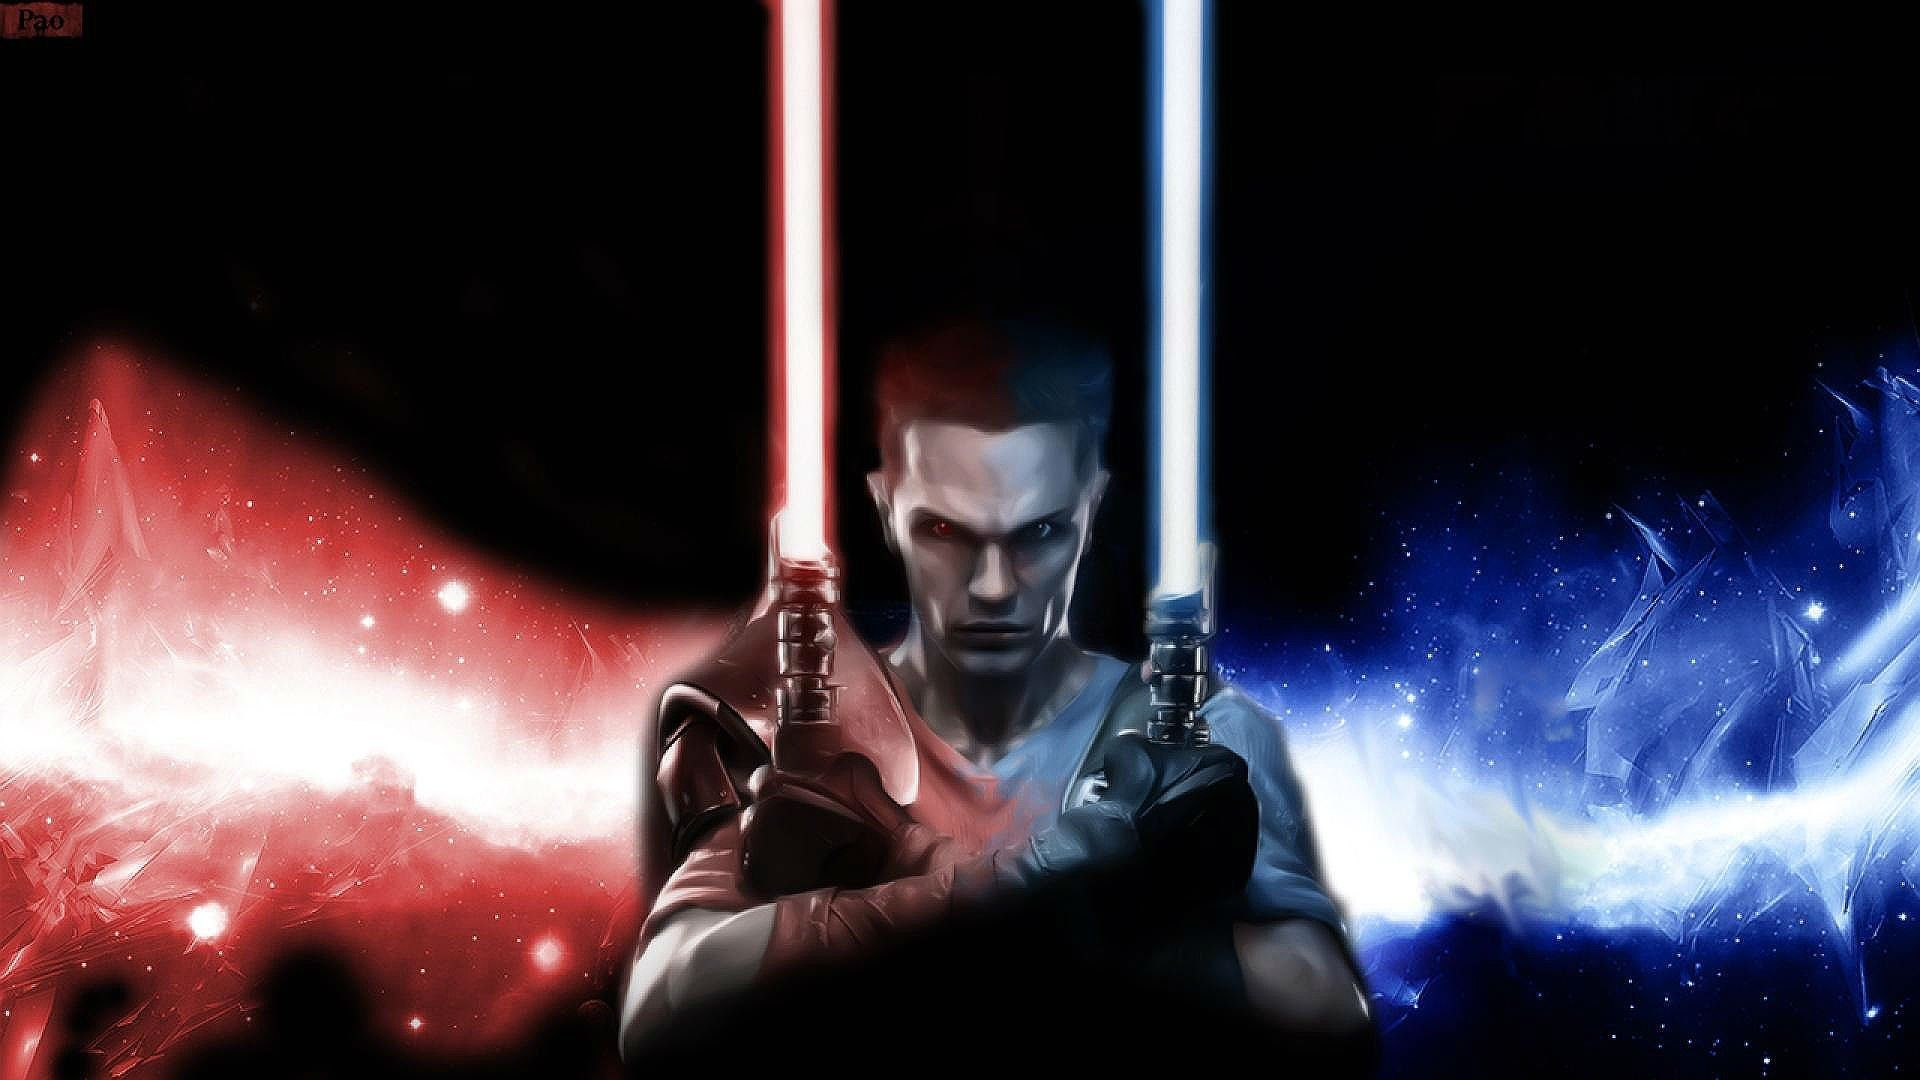 Star Wars Force Unleashed Wallpaper